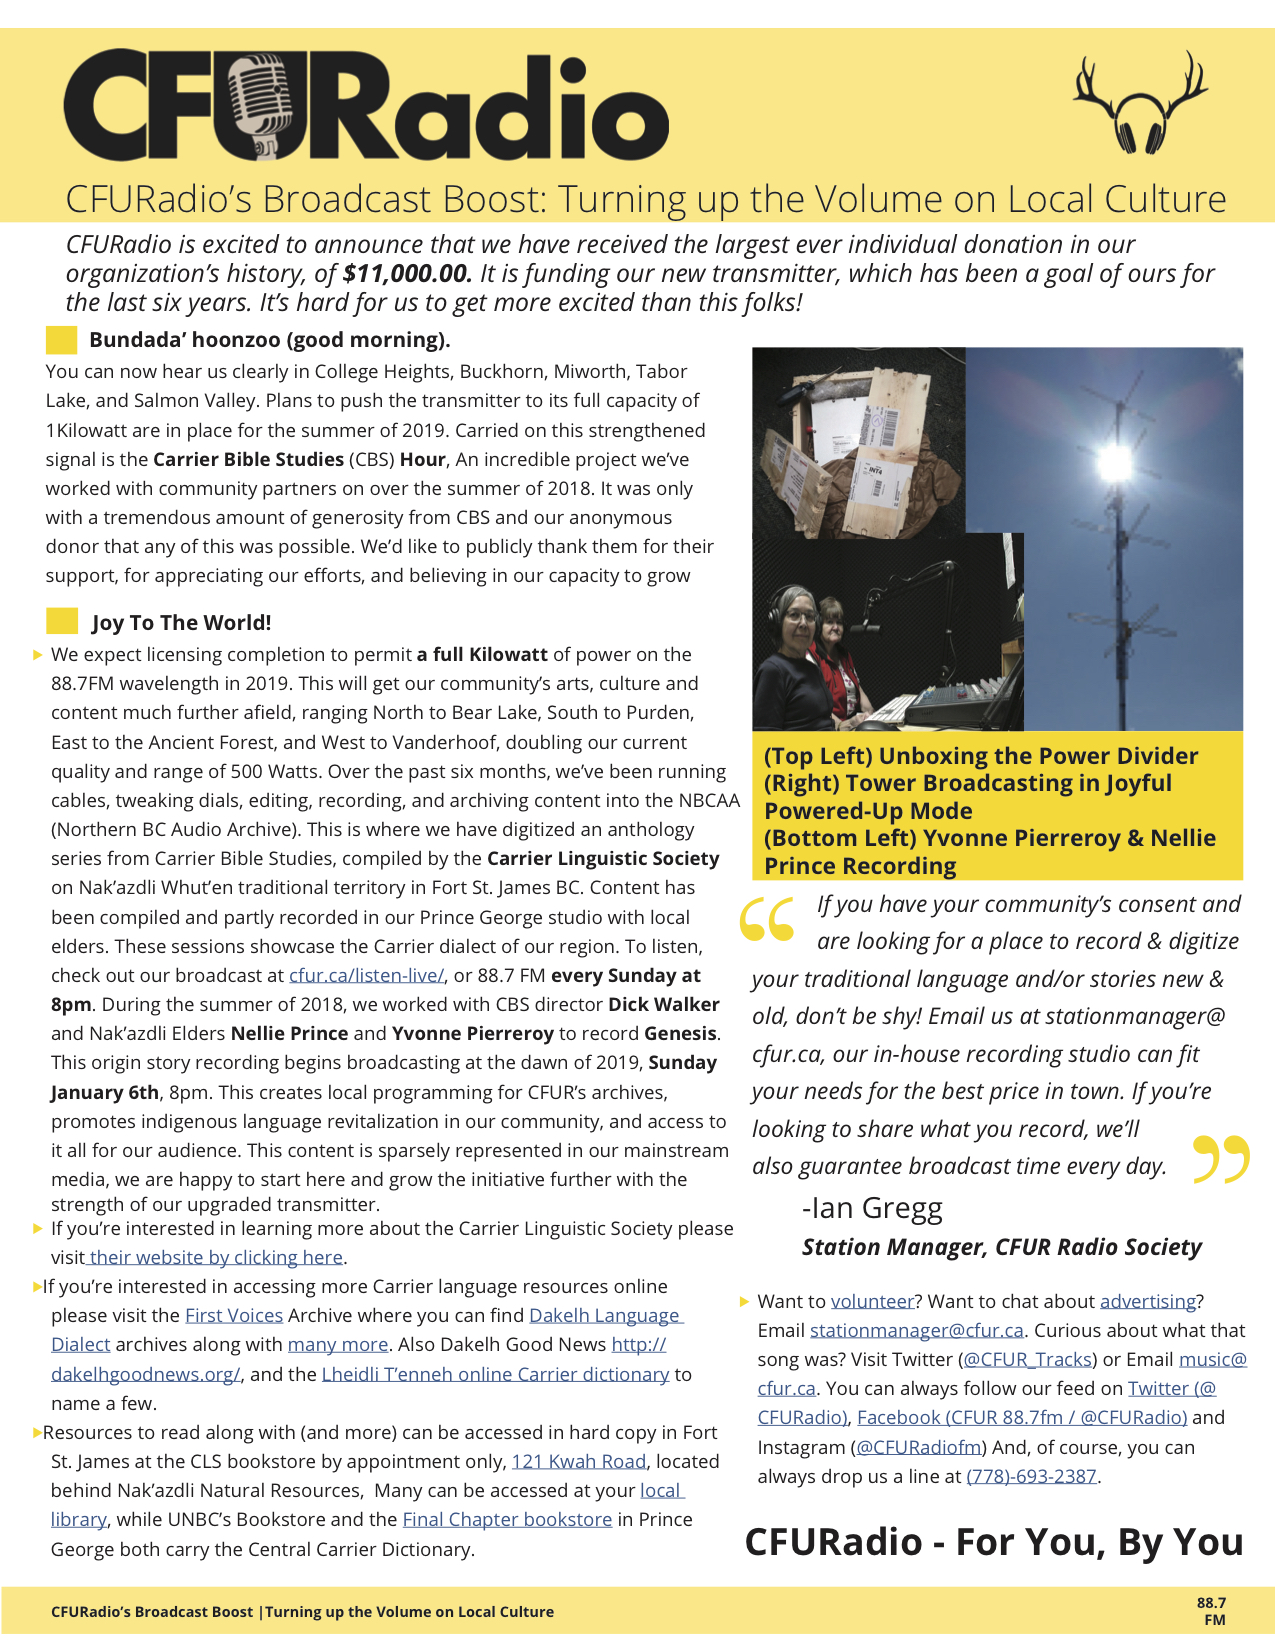 20181212 - CBS & Transmitter - CFUR Press Release 1.jpg